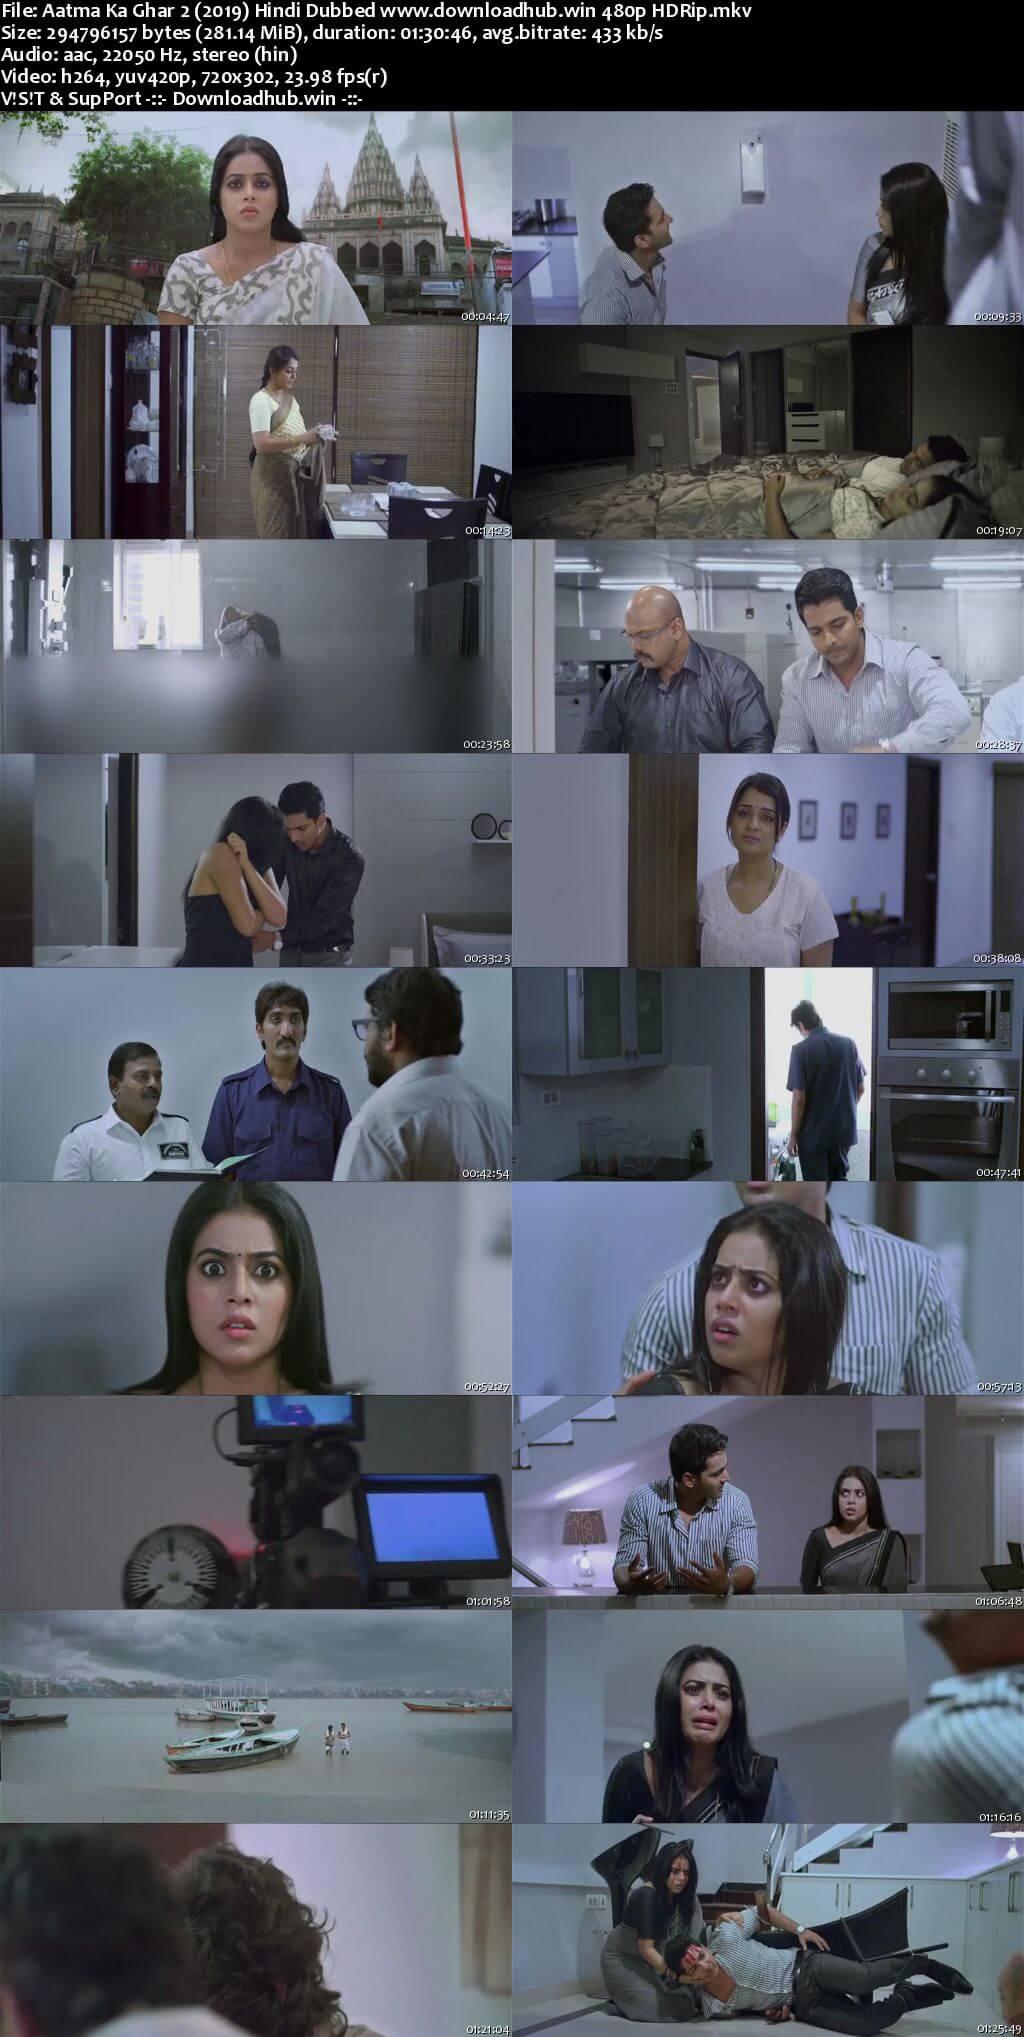 Aatma Ka Ghar 2 2019 Hindi Dubbed 280MB HDRip 480p